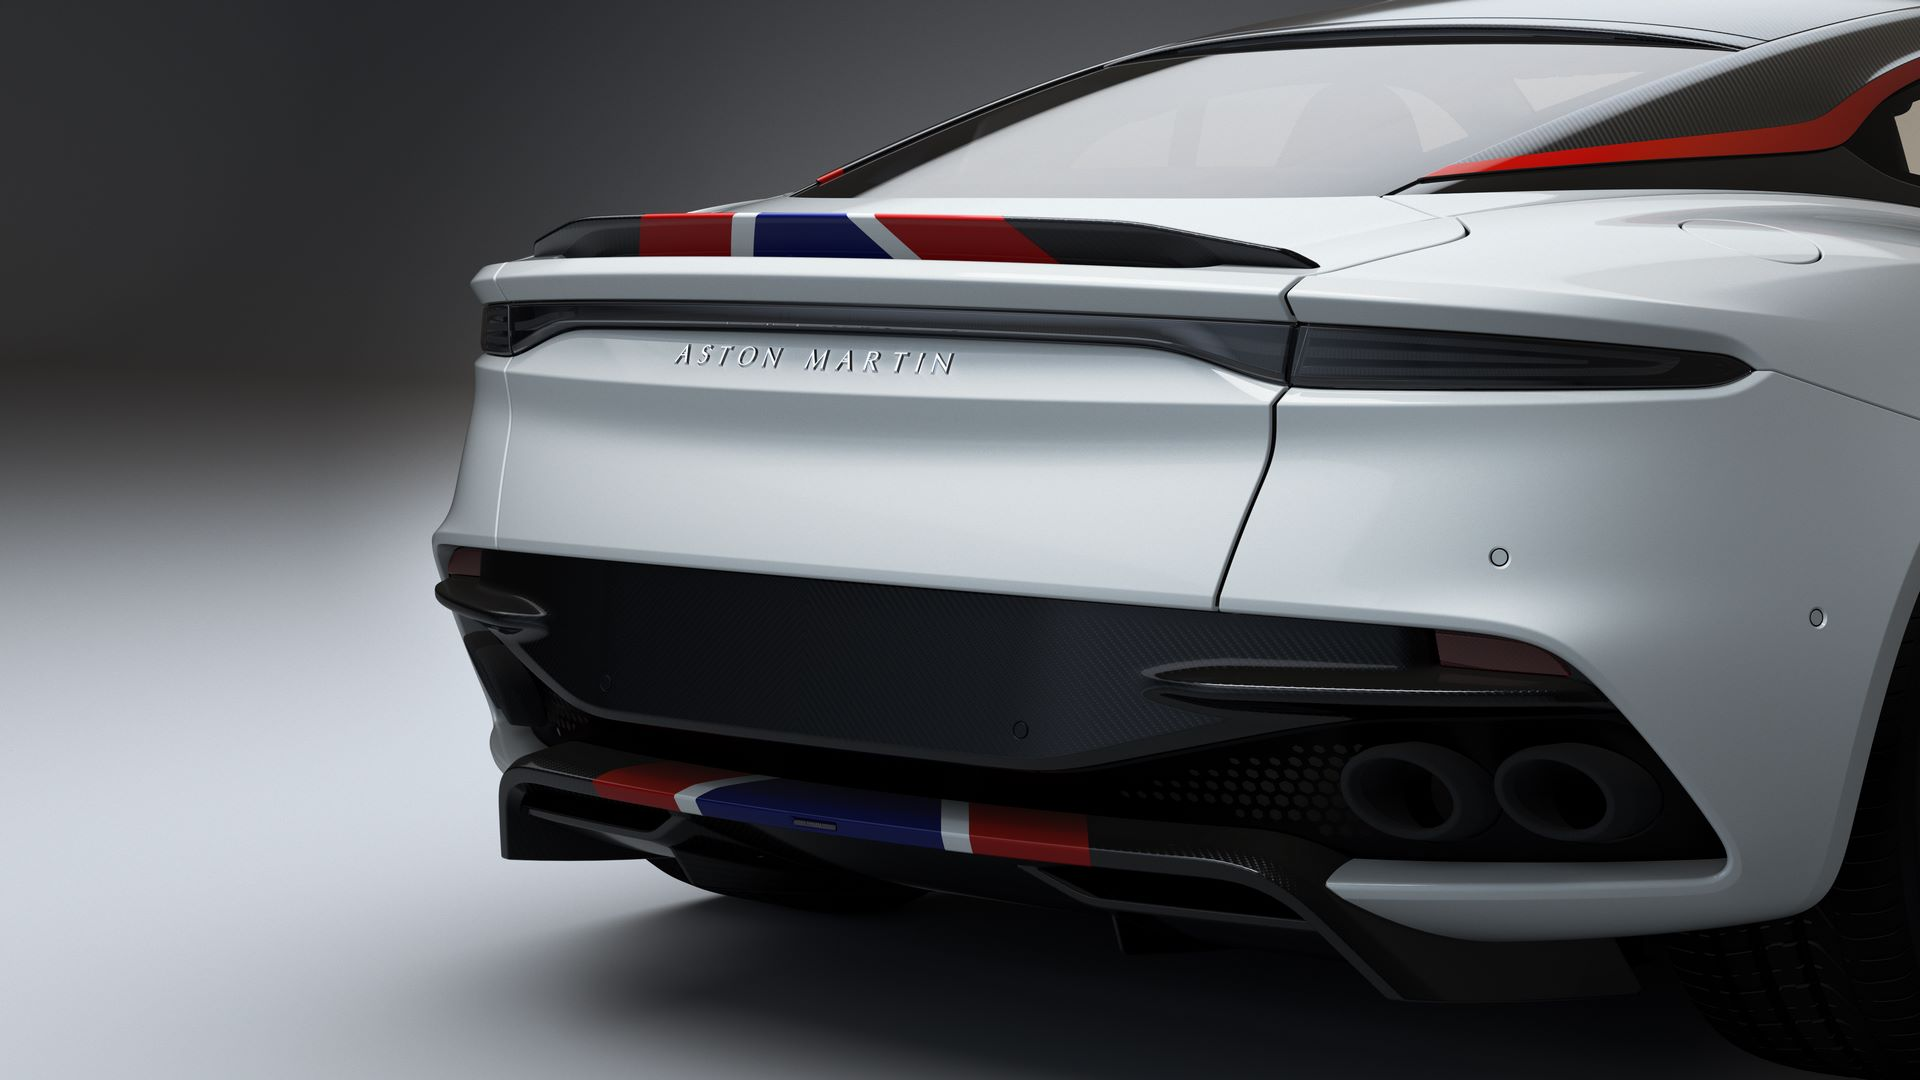 Aston-Martin-DBS-Superleggera-Concorde-Edition_10